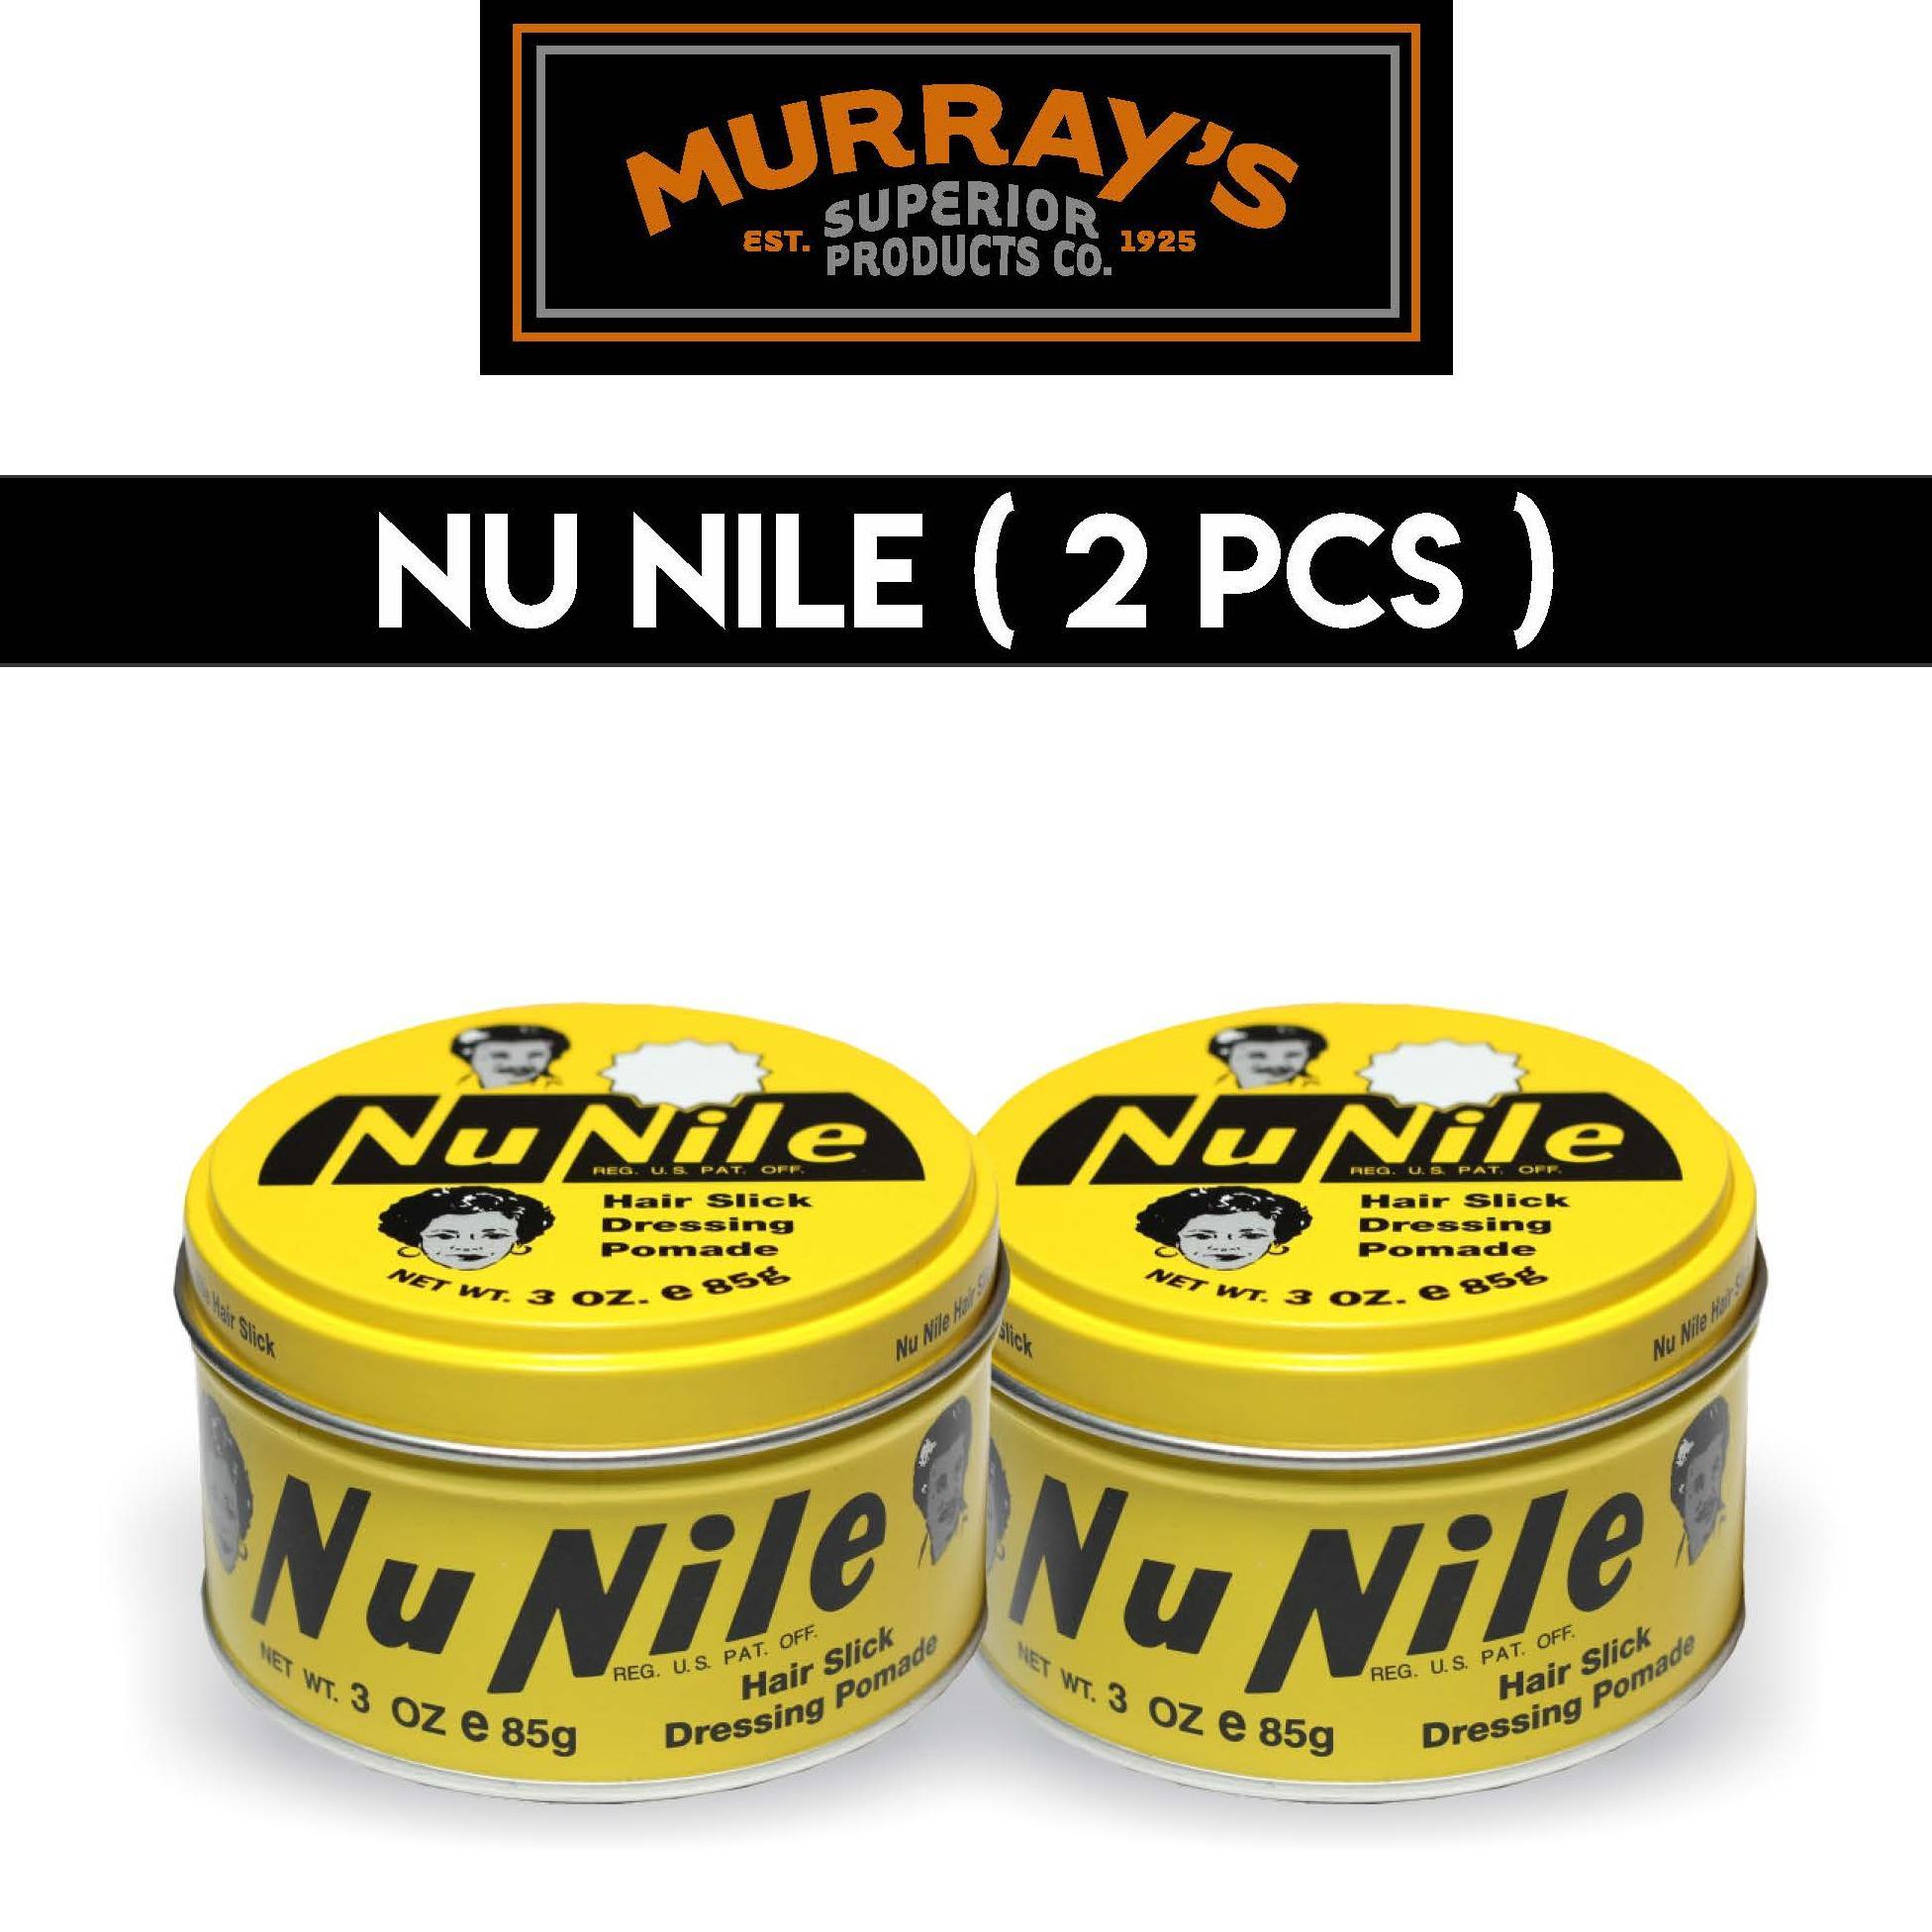 Murrays Nunile Bundling 2 PCS